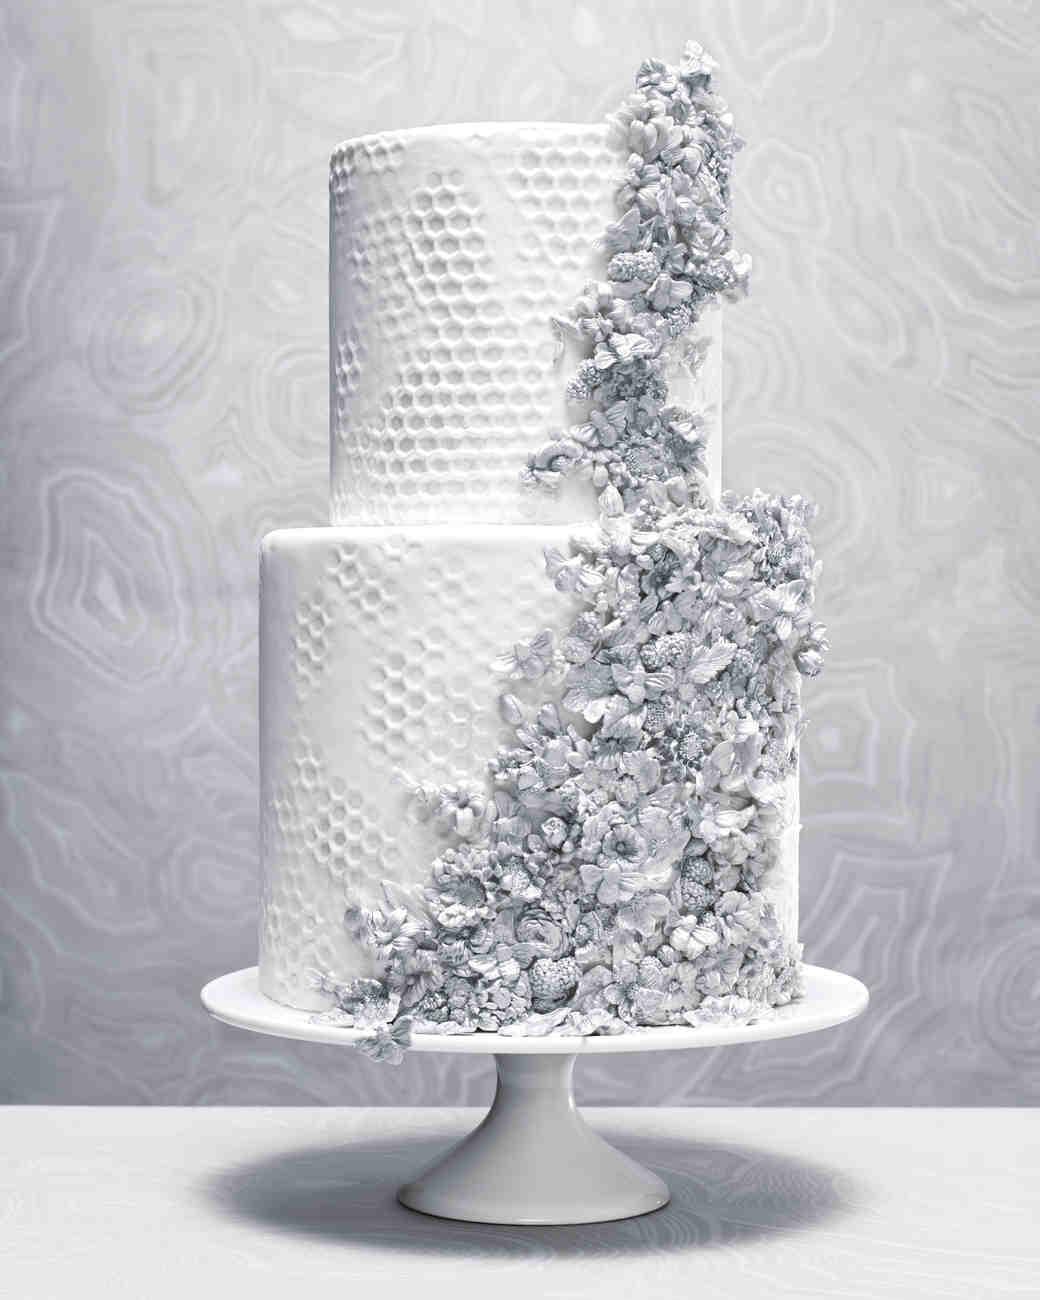 Design Your Own Wedding Cake: 8 Platinum Wedding Cakes Ideas